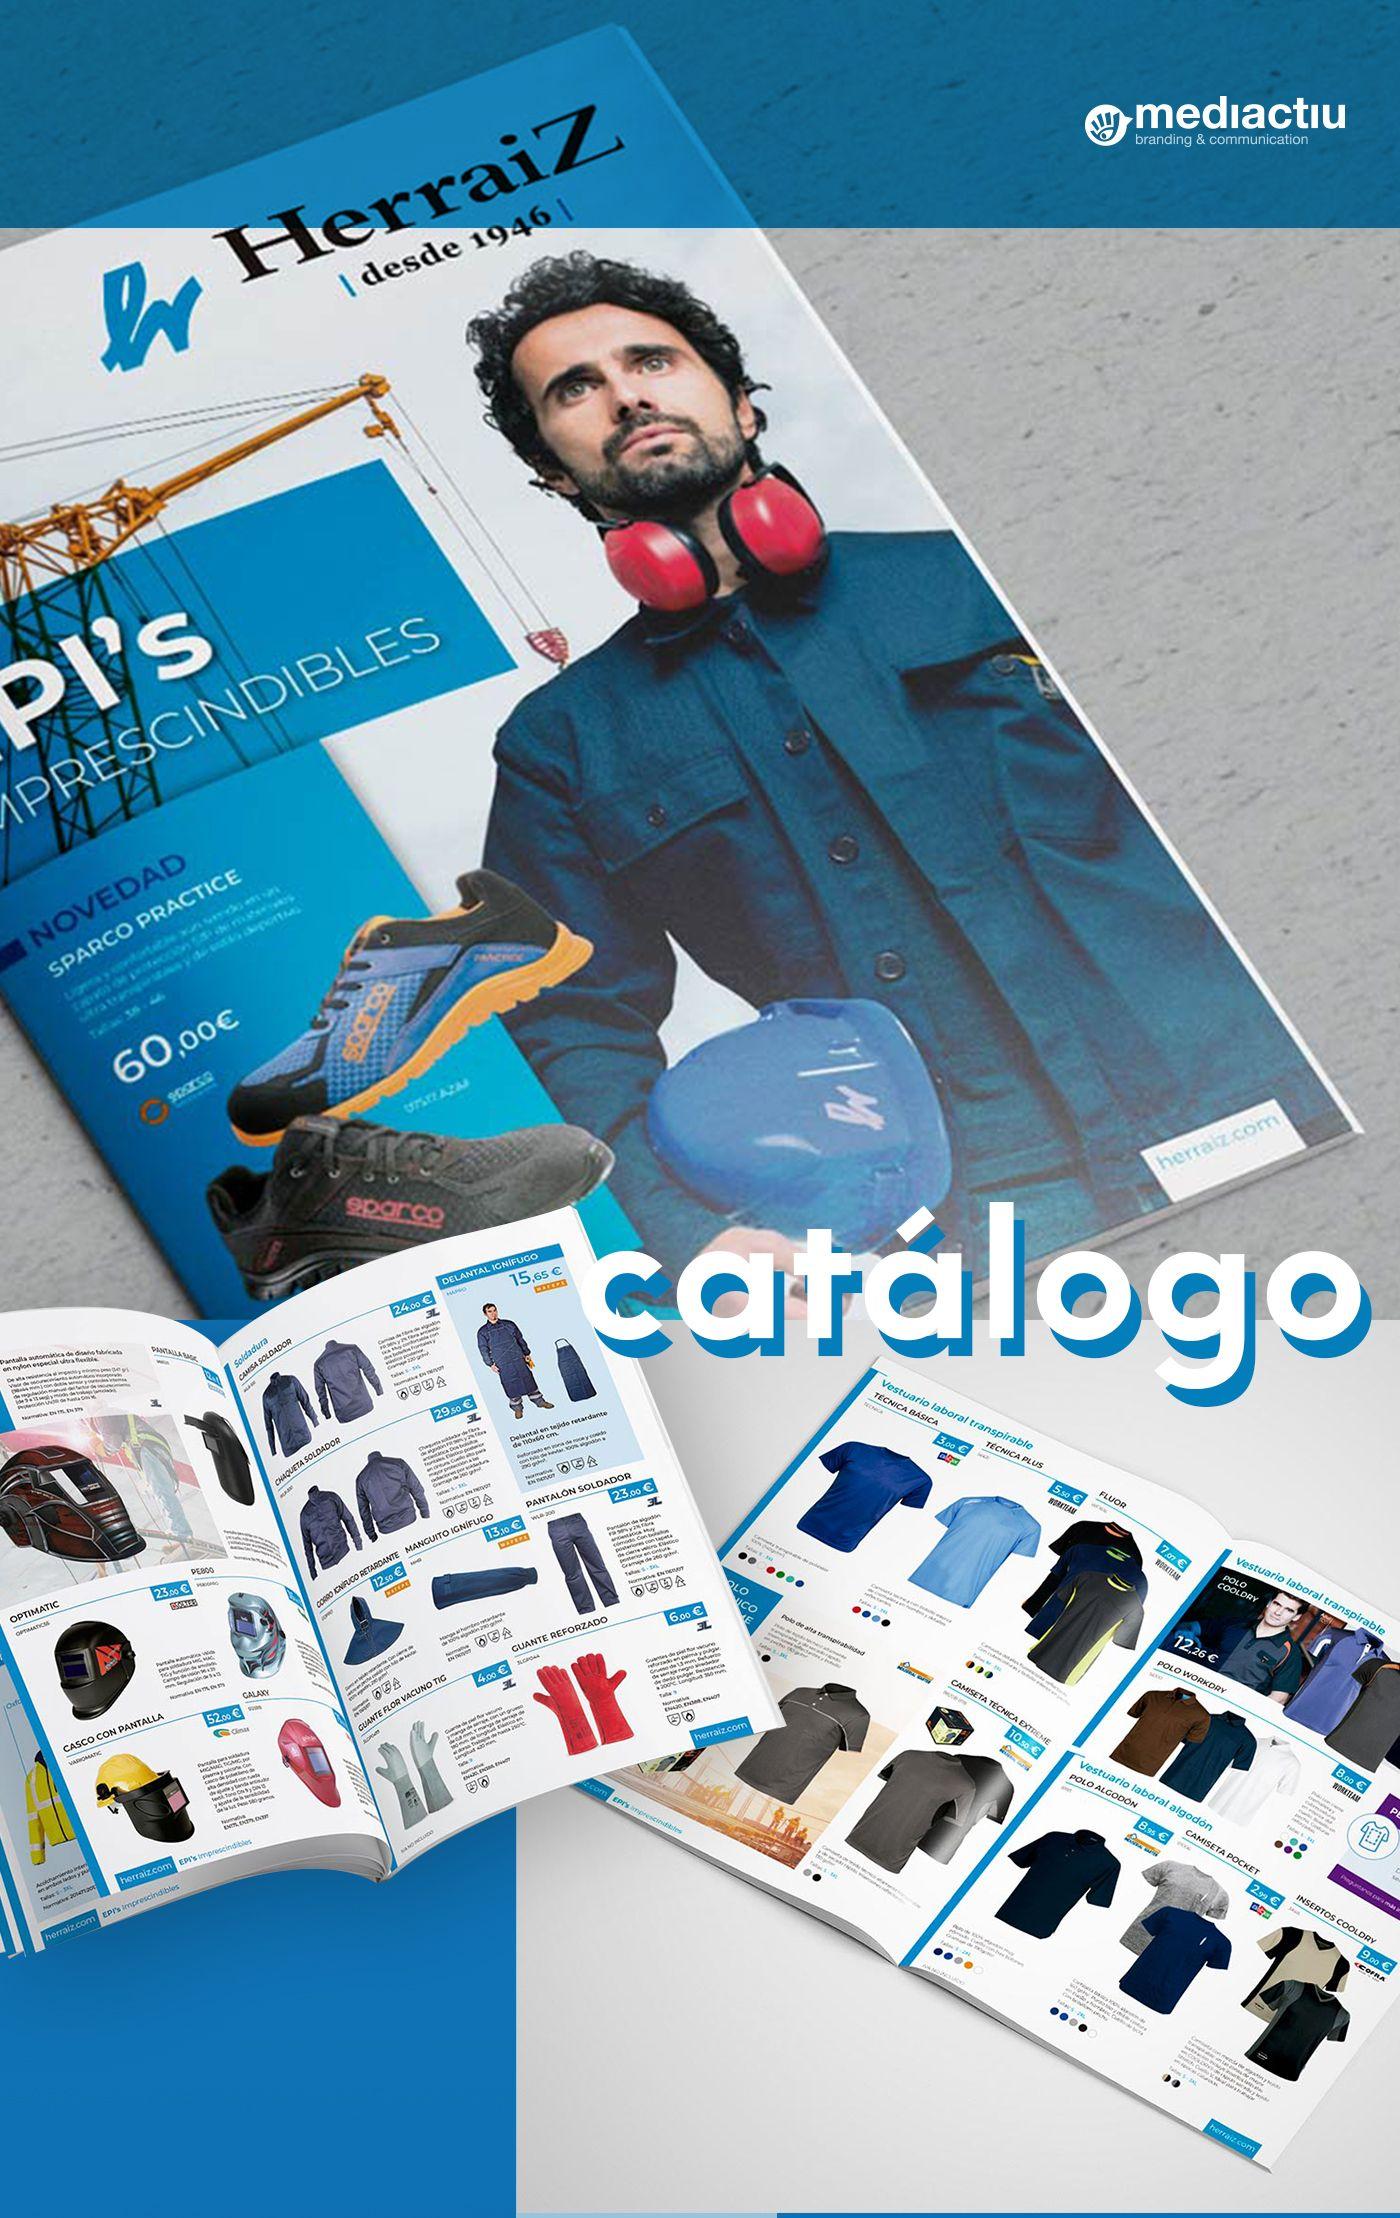 Catálogo Para Epi S Disenos De Unas Diseño Catalogo Marketing Digital